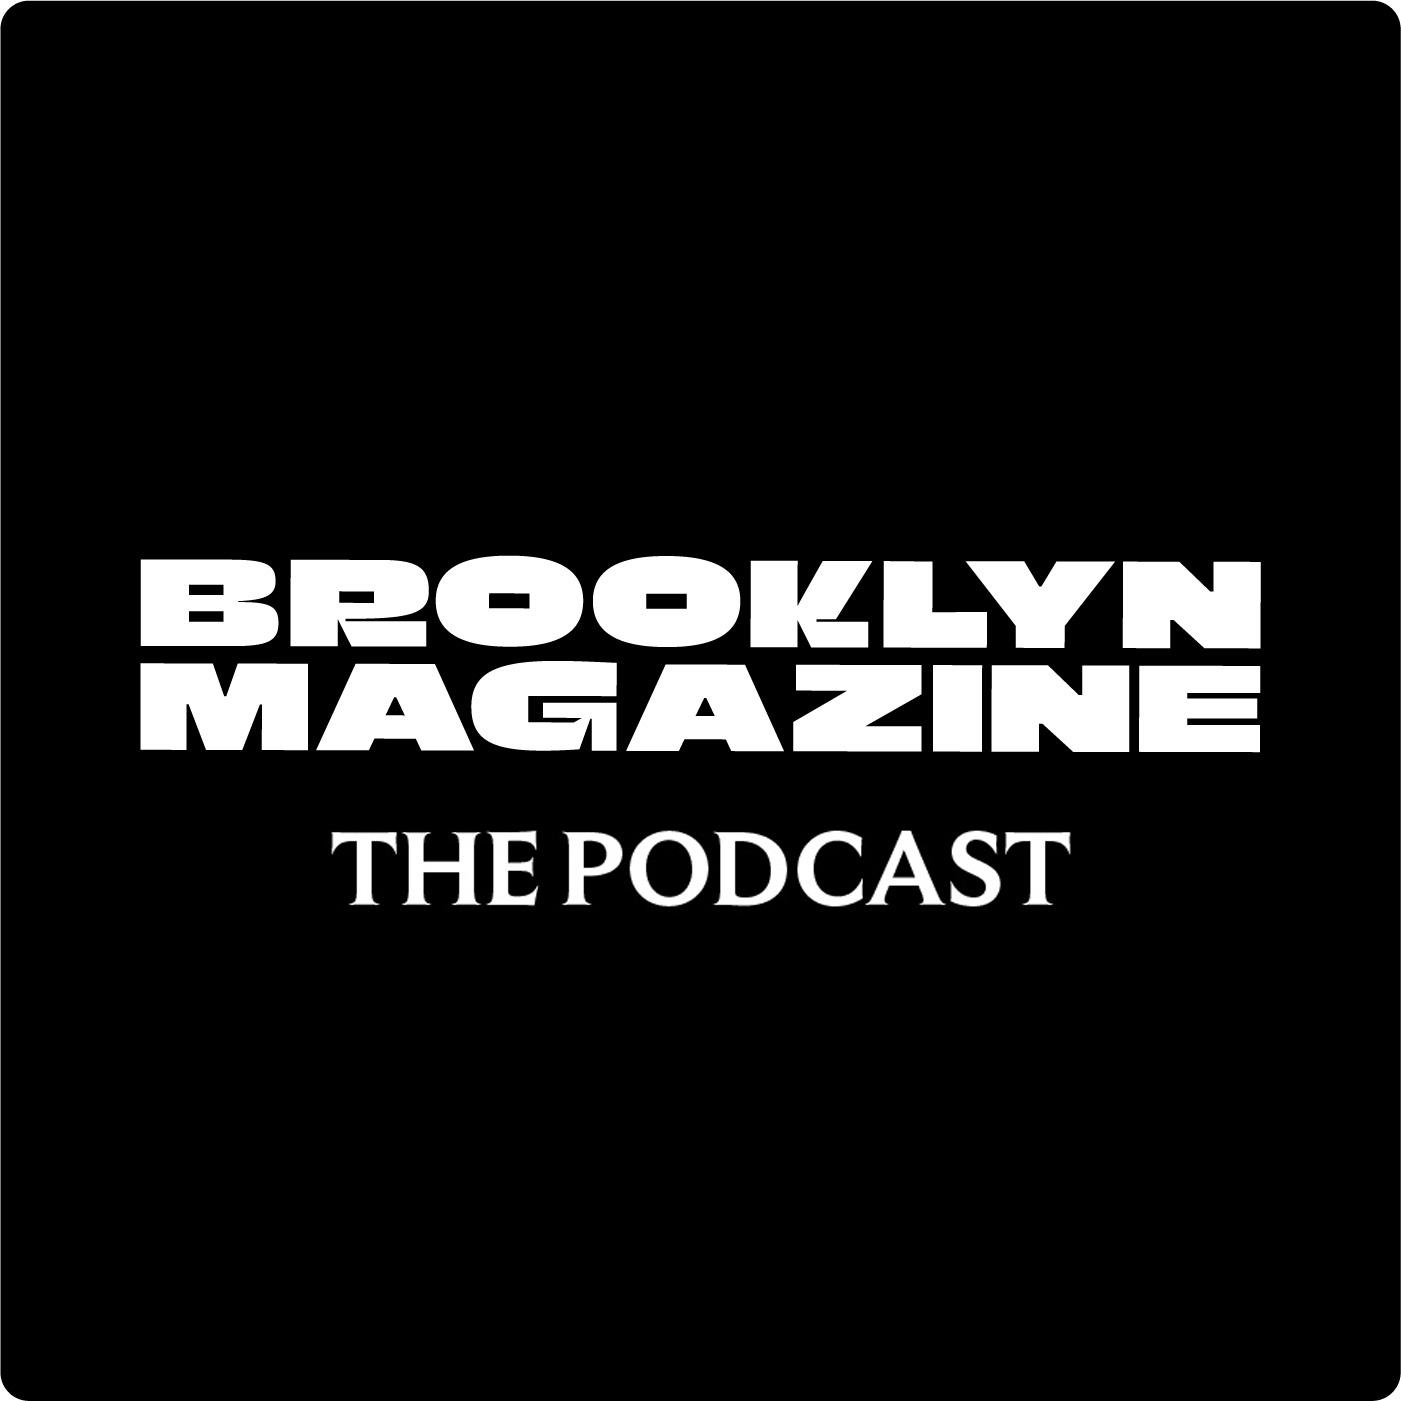 Brooklyn Magazine: The Podcast show art